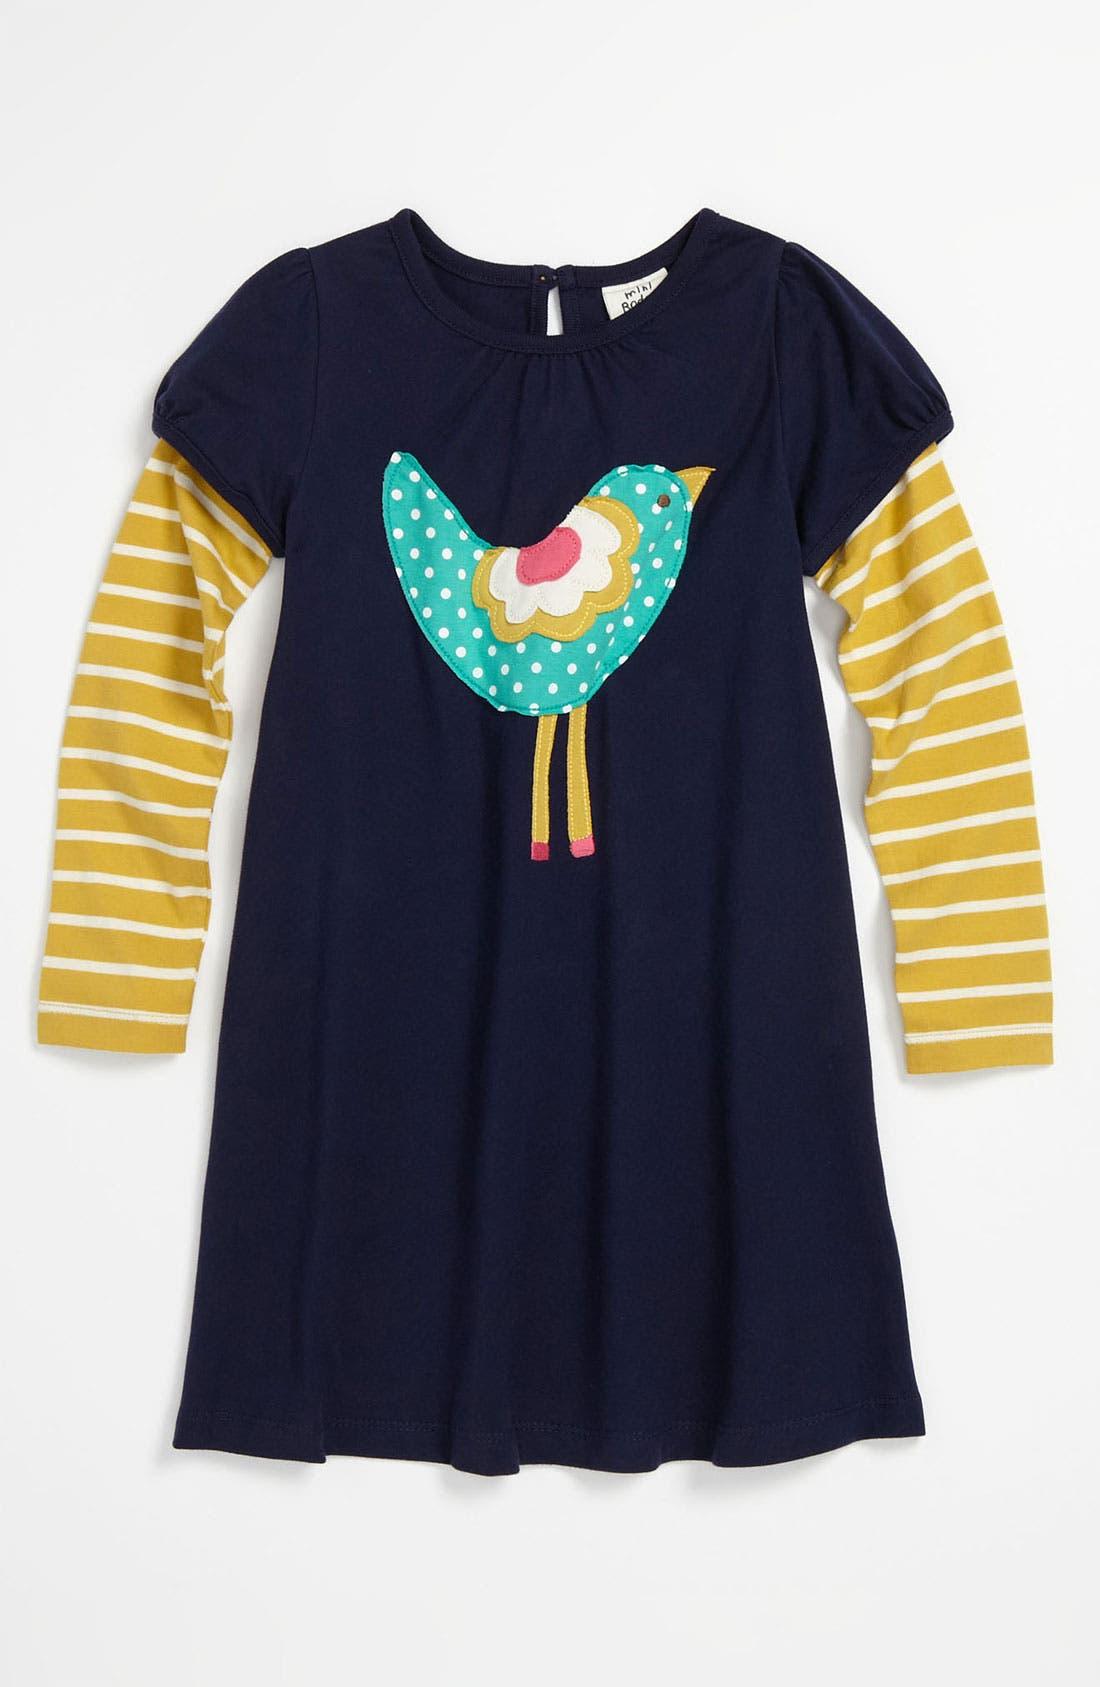 Main Image - Mini Boden 'Fun' Logo Dress (Toddler, Little Girls & Big Girls)